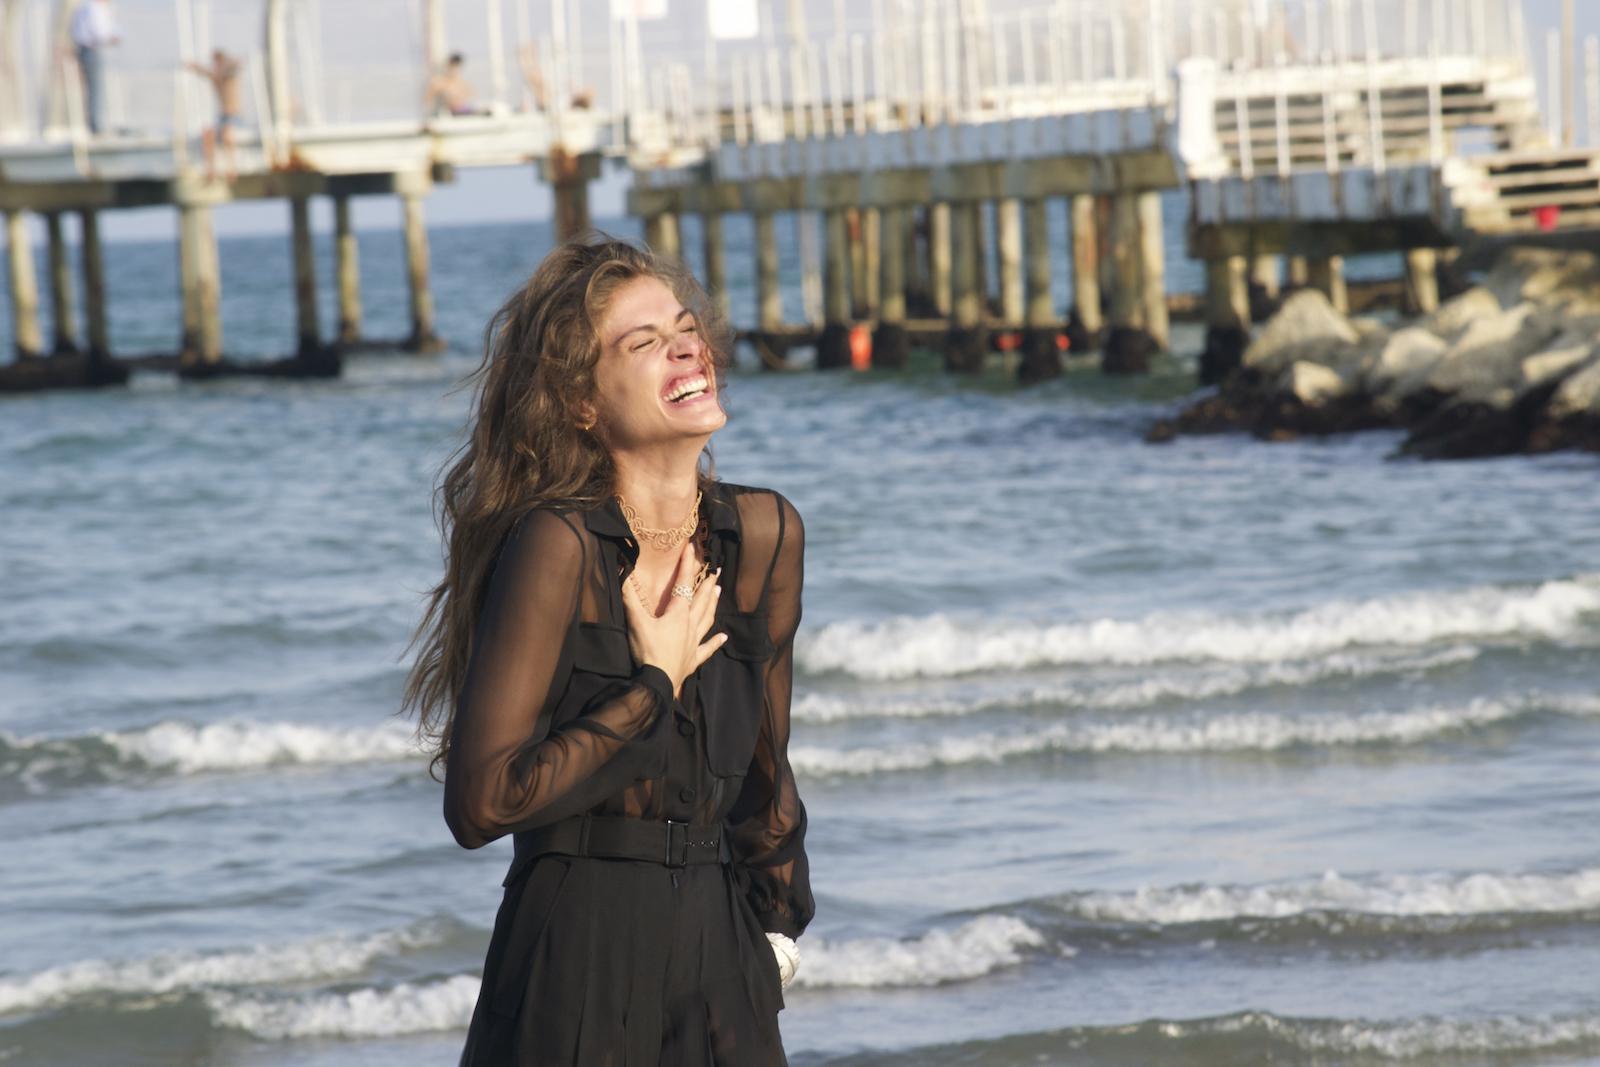 Venezia 2015: La madrina Elisa Sednaoui al photocall